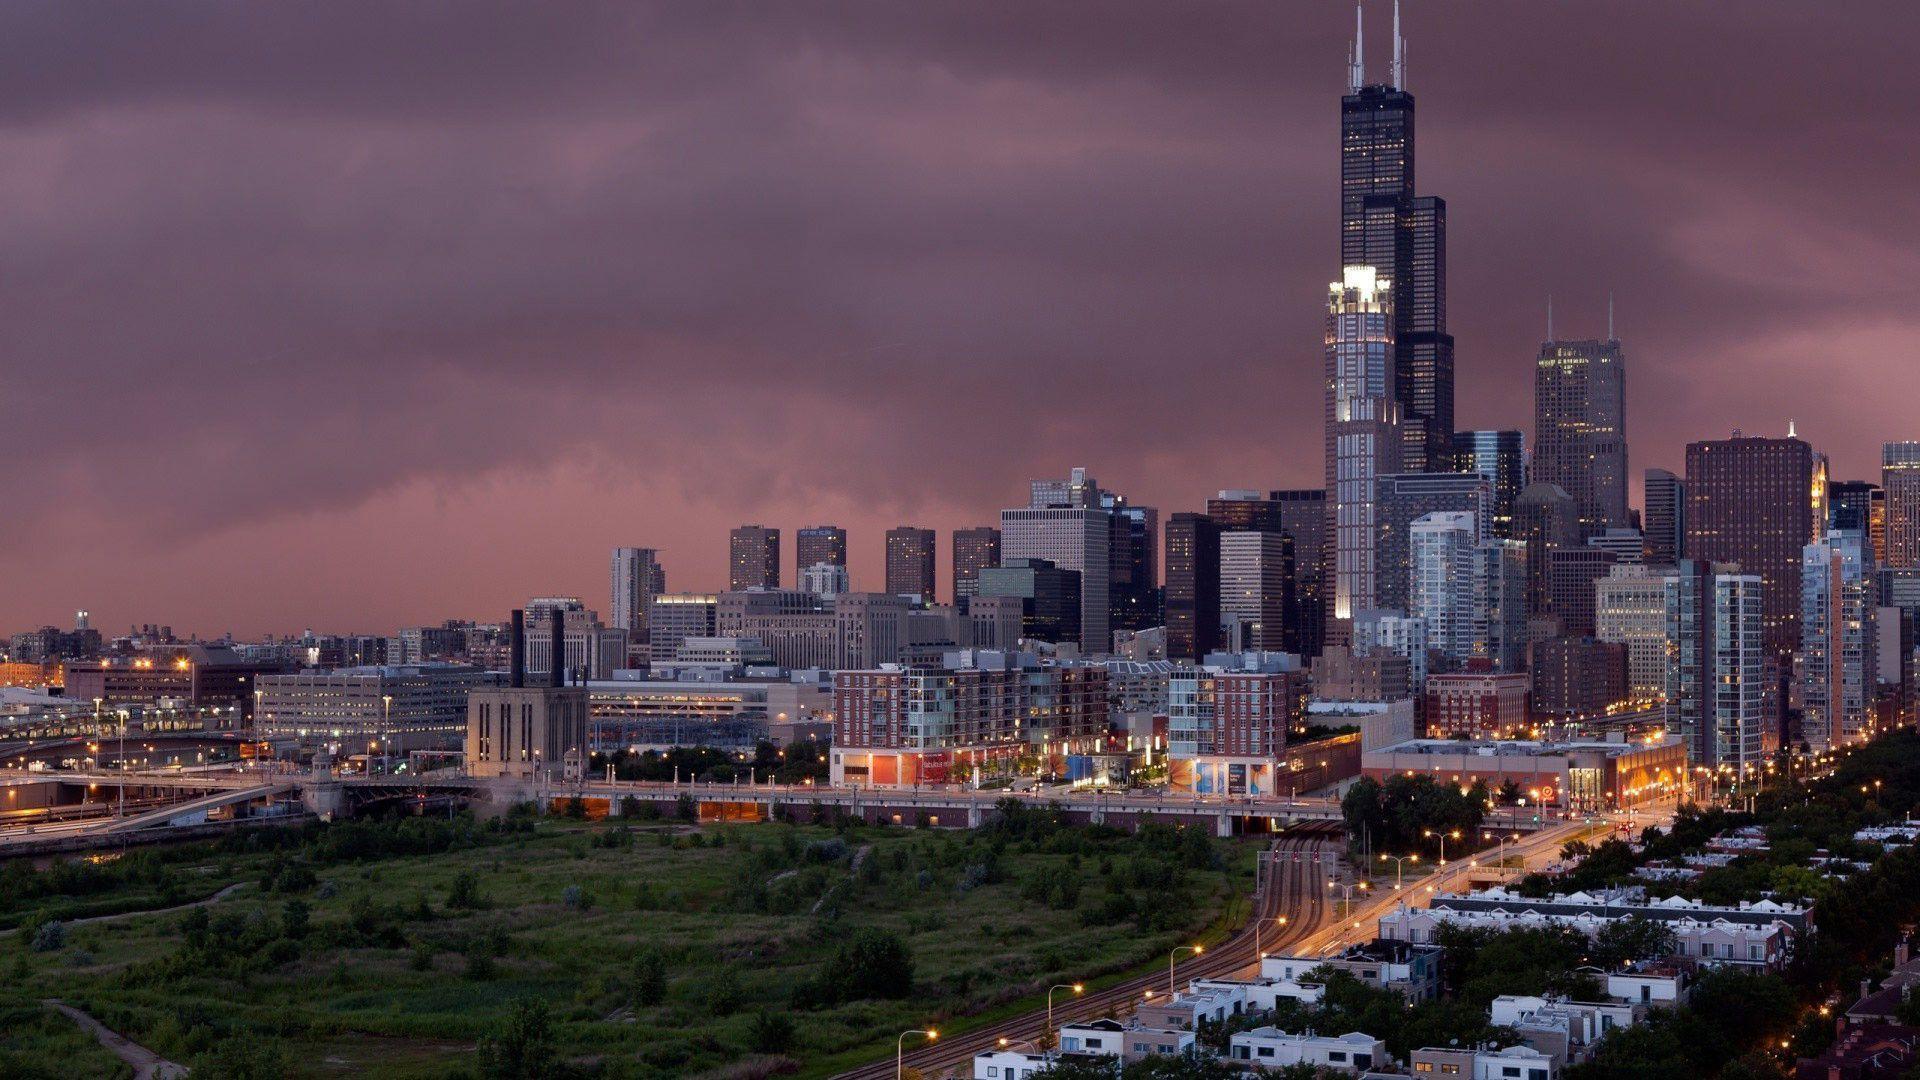 Chicago wallpaper #